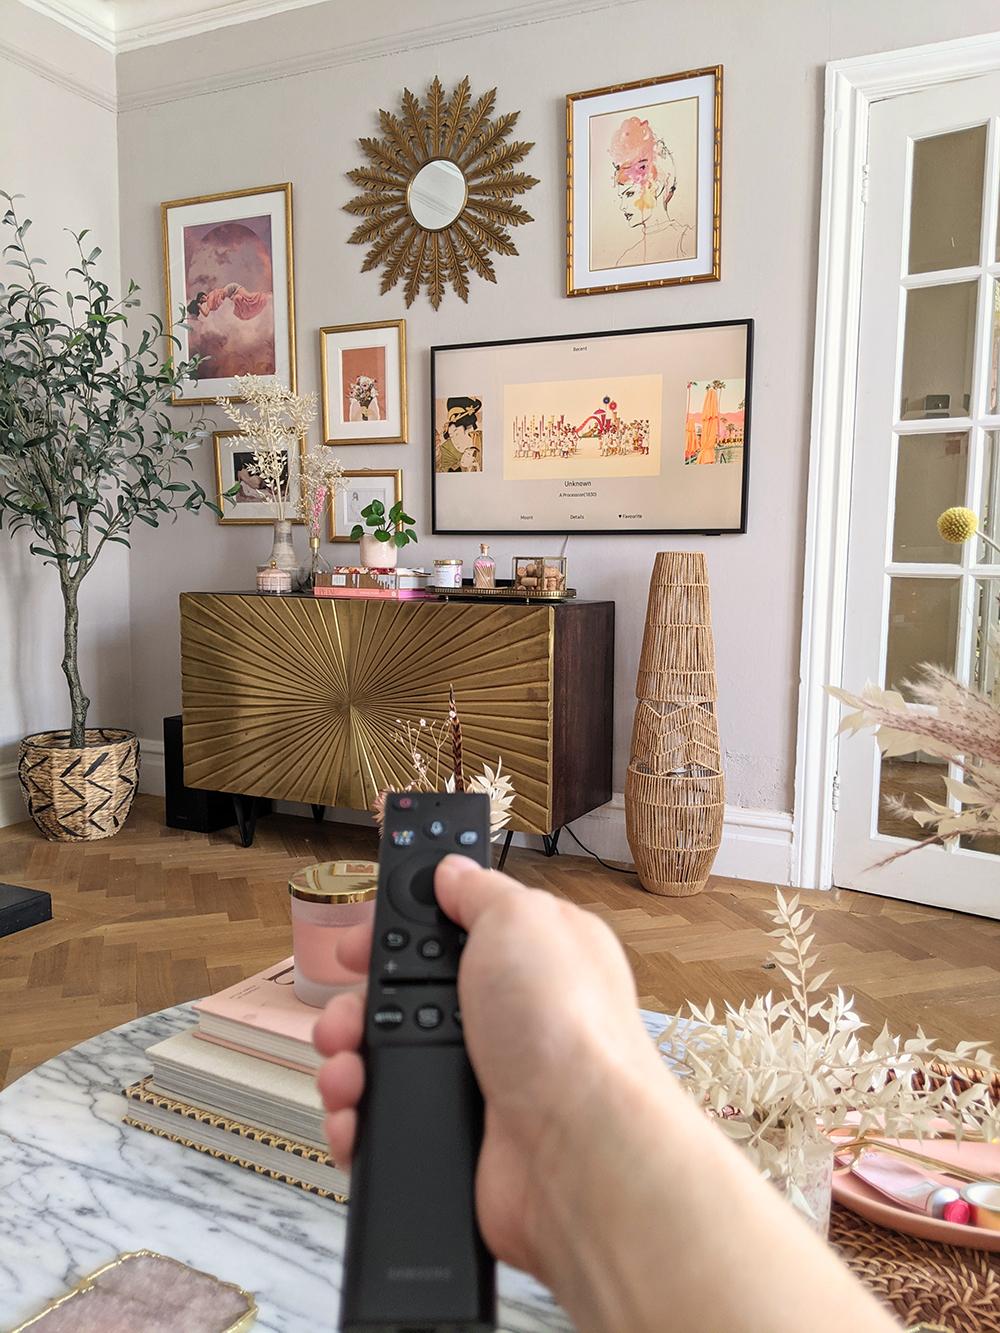 Samsung Frame TV 2021 changing the art